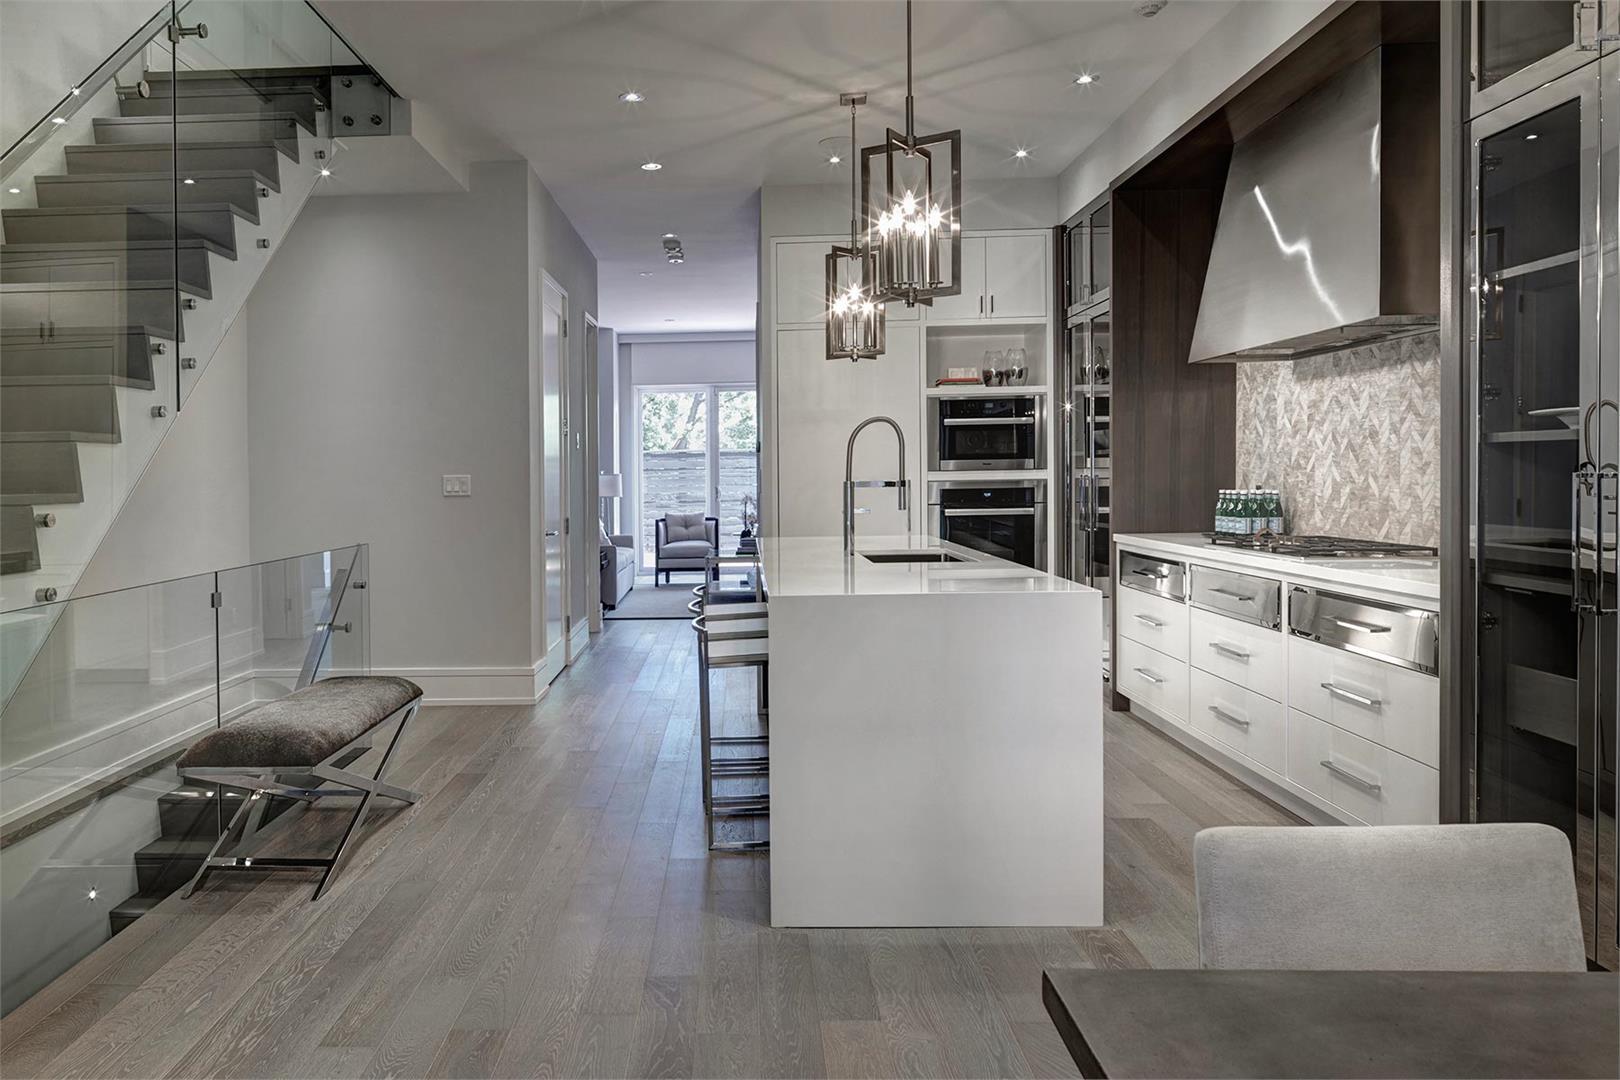 Maisons DeVille Interior, Toronto